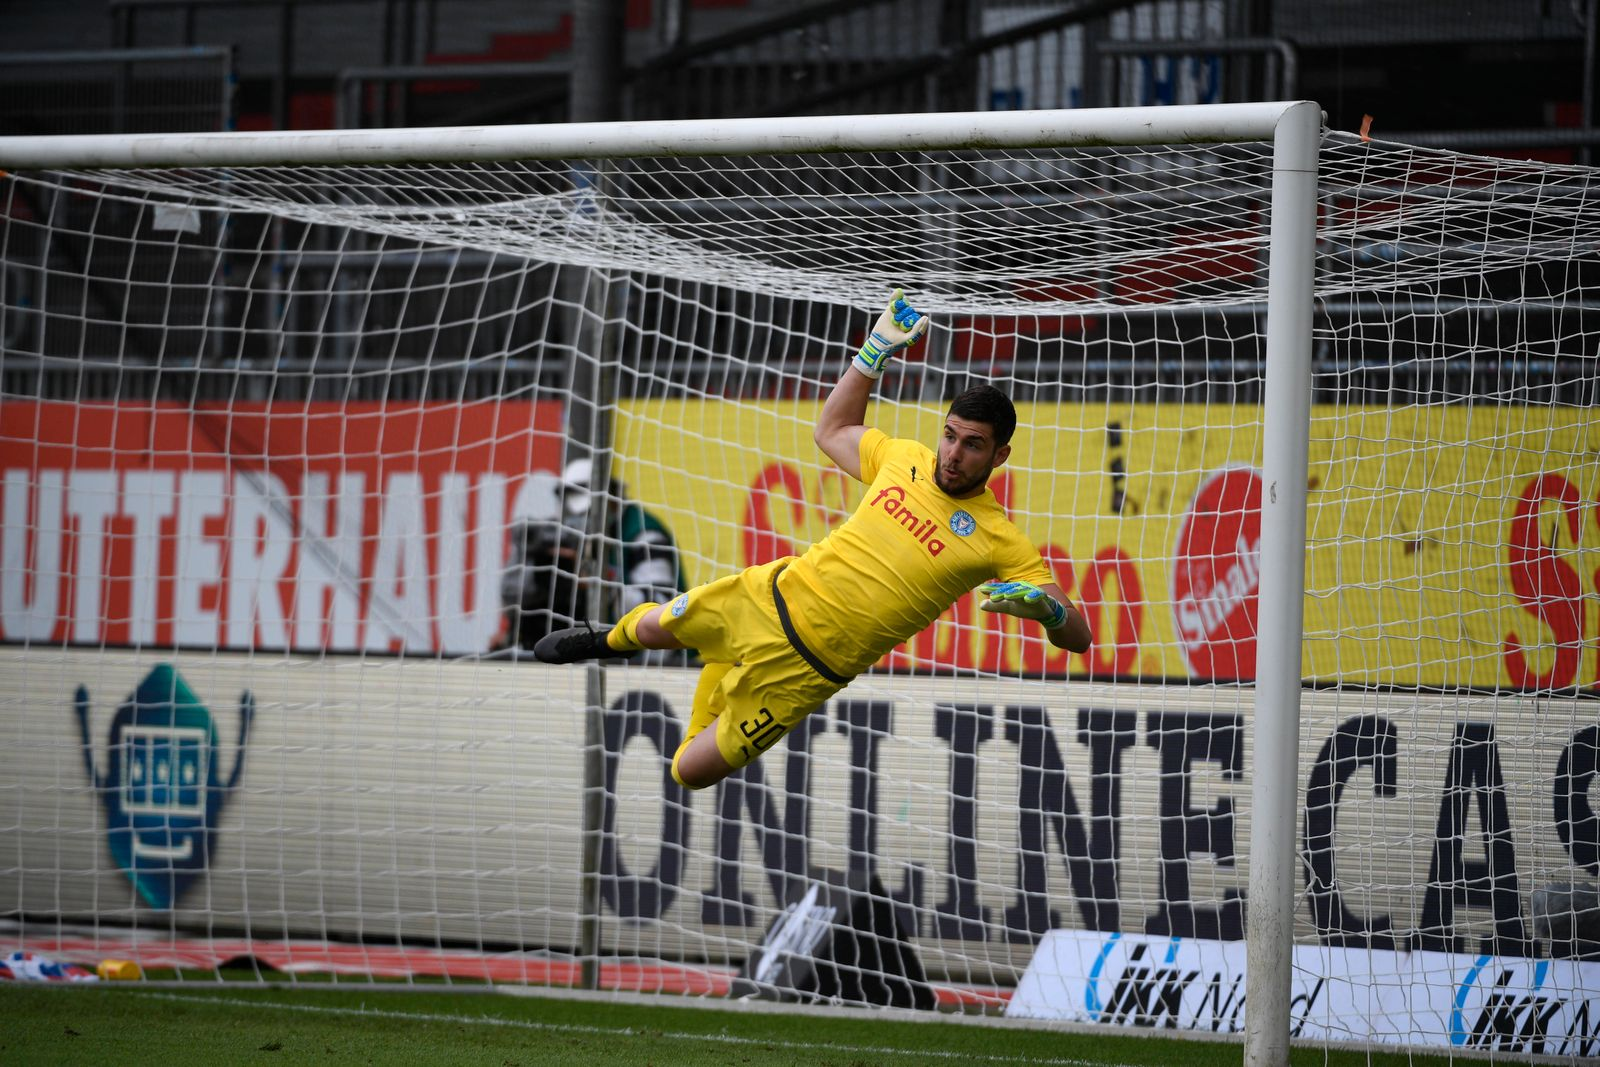 Ioannis Gelios (KSV, 30) fliegt am Ball vorbei, Fußball, Männer, Holstein Kiel vs 1. FC Nürnberg, 2. Bundesliga, 34. Sp